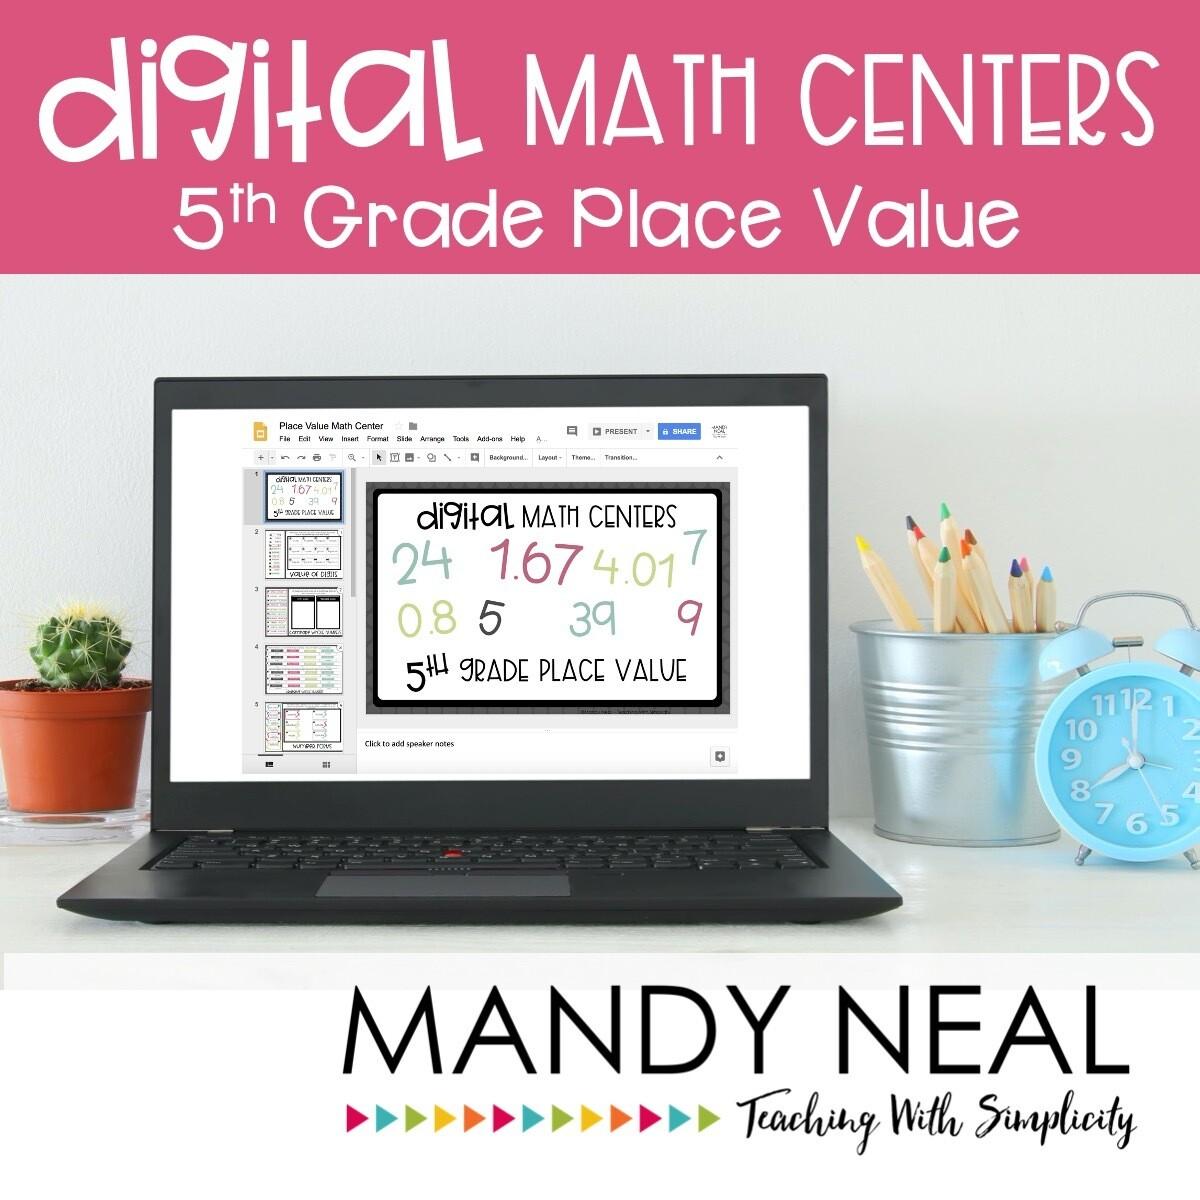 Fifth Grade Digital Math Centers Place Value